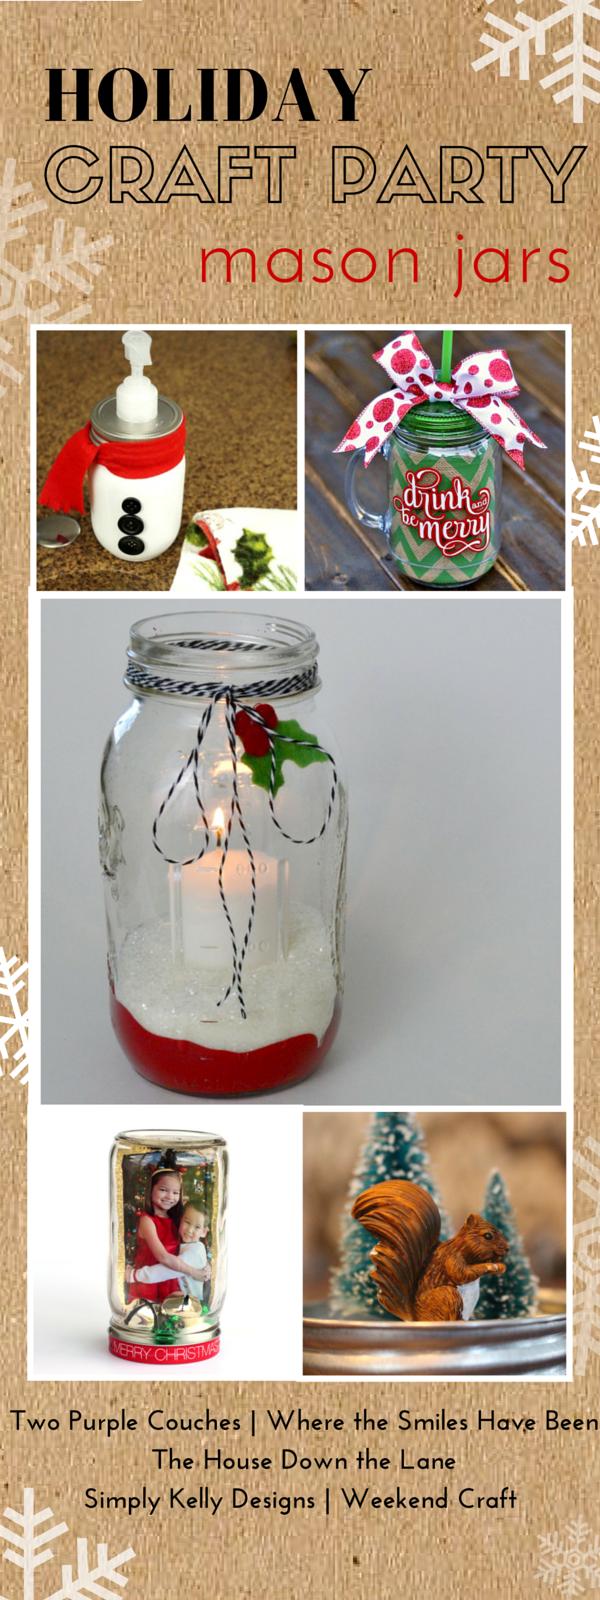 Holiday Craft Party Mason Jars